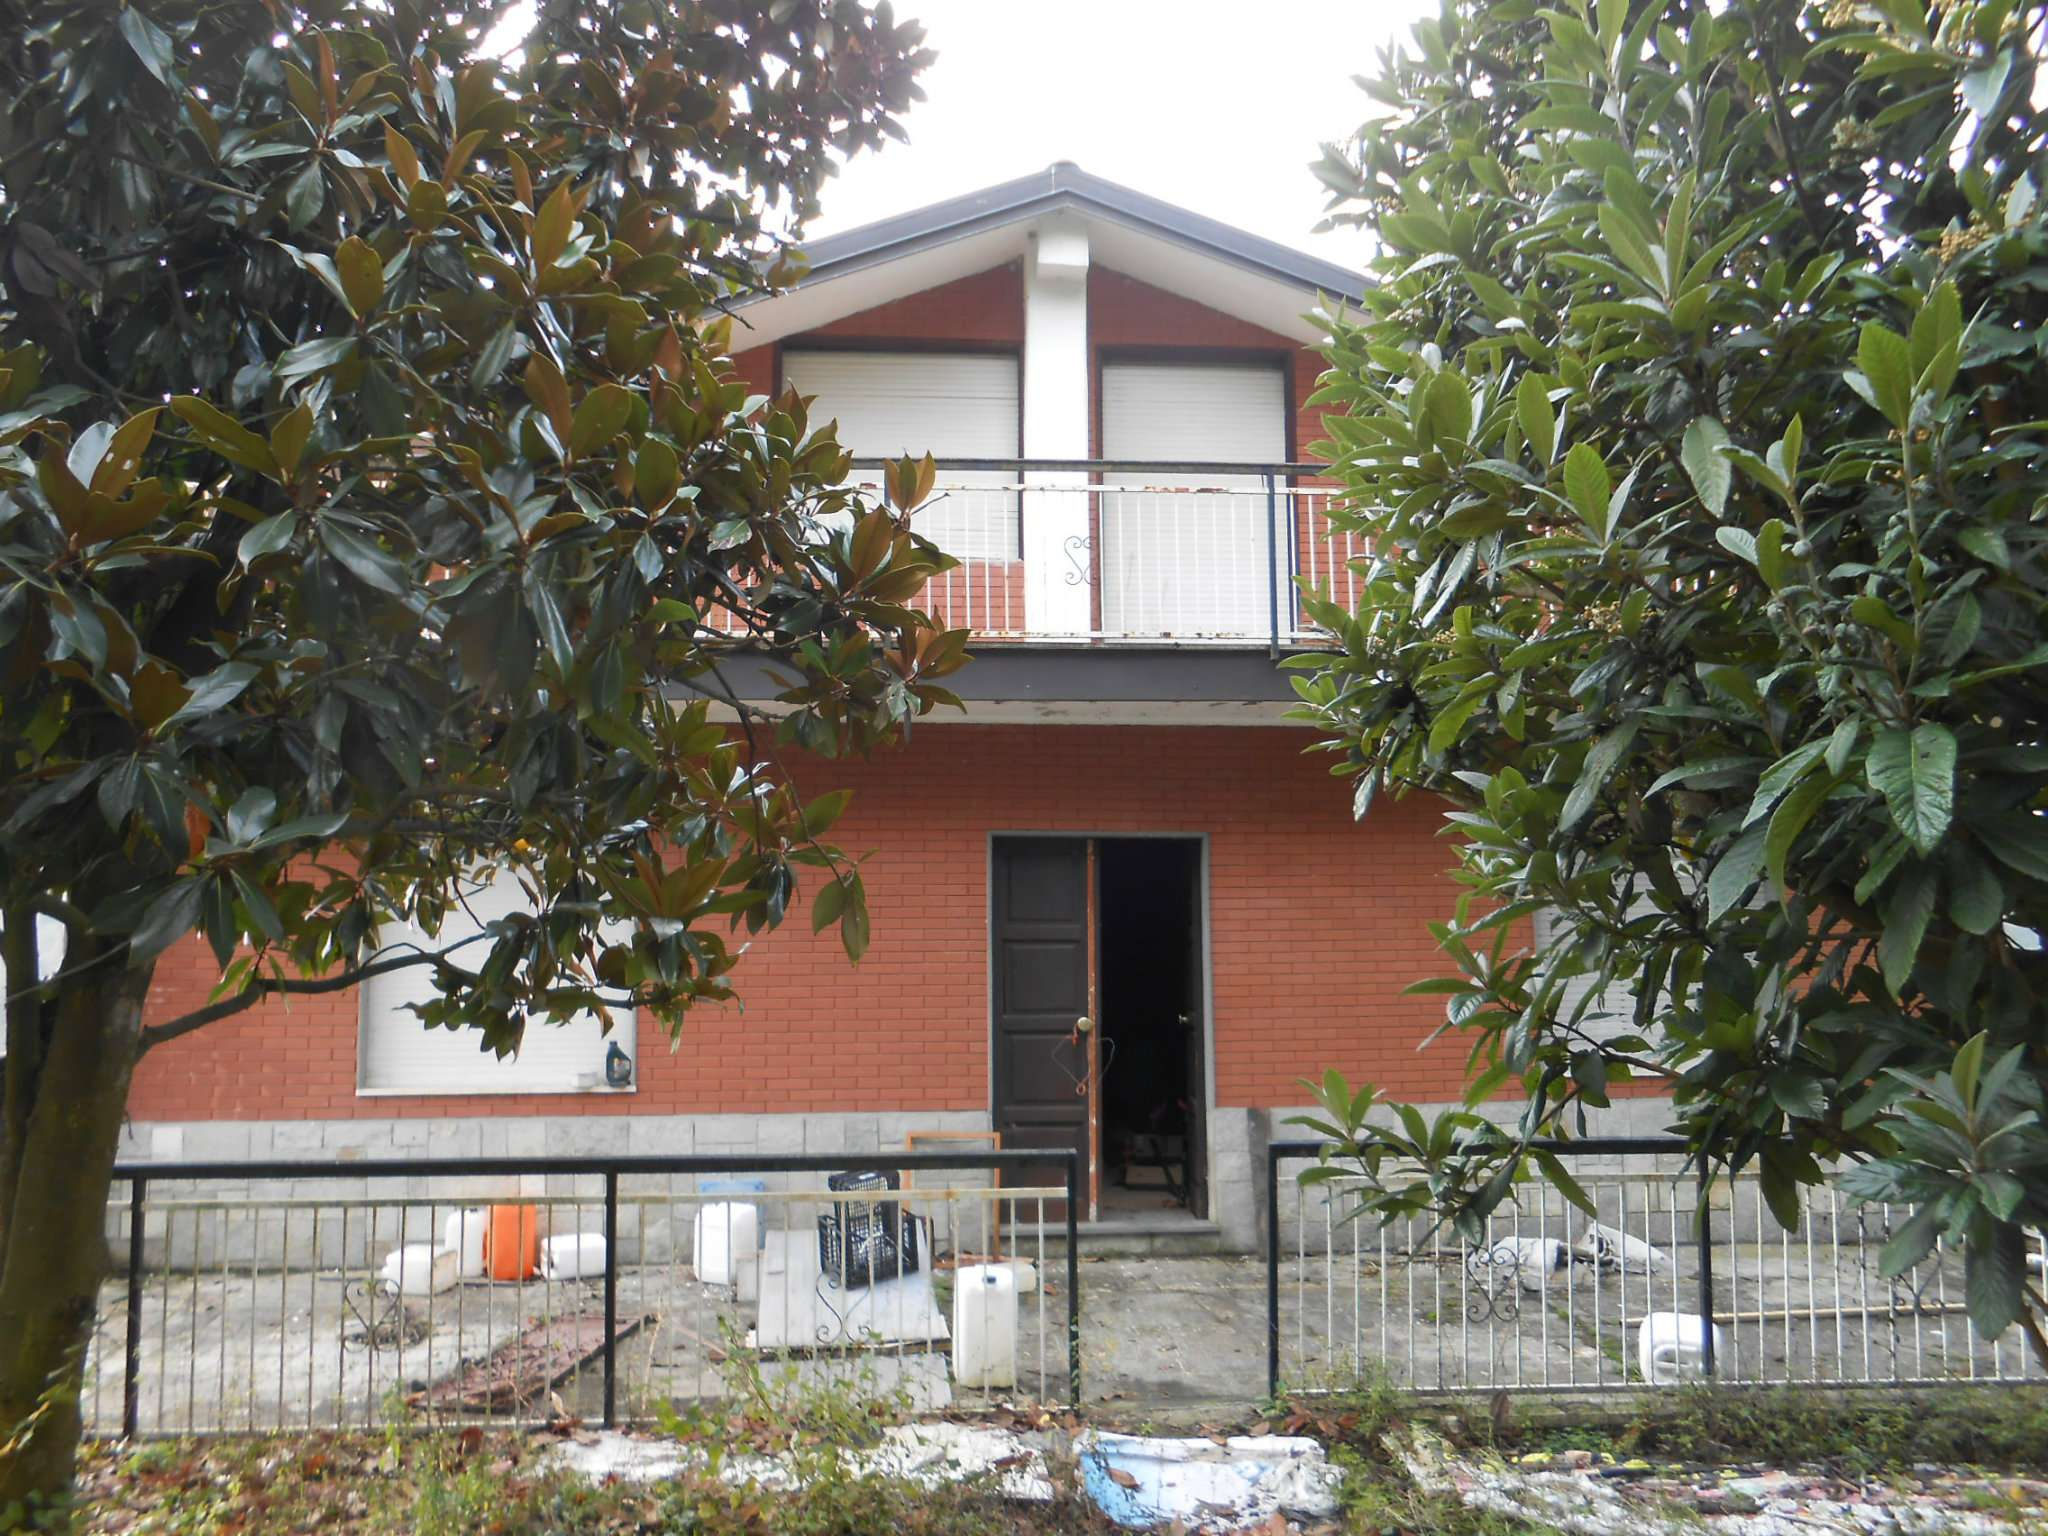 CASTELNUOVO D.B. - casa aperta su 4 lati in collina.